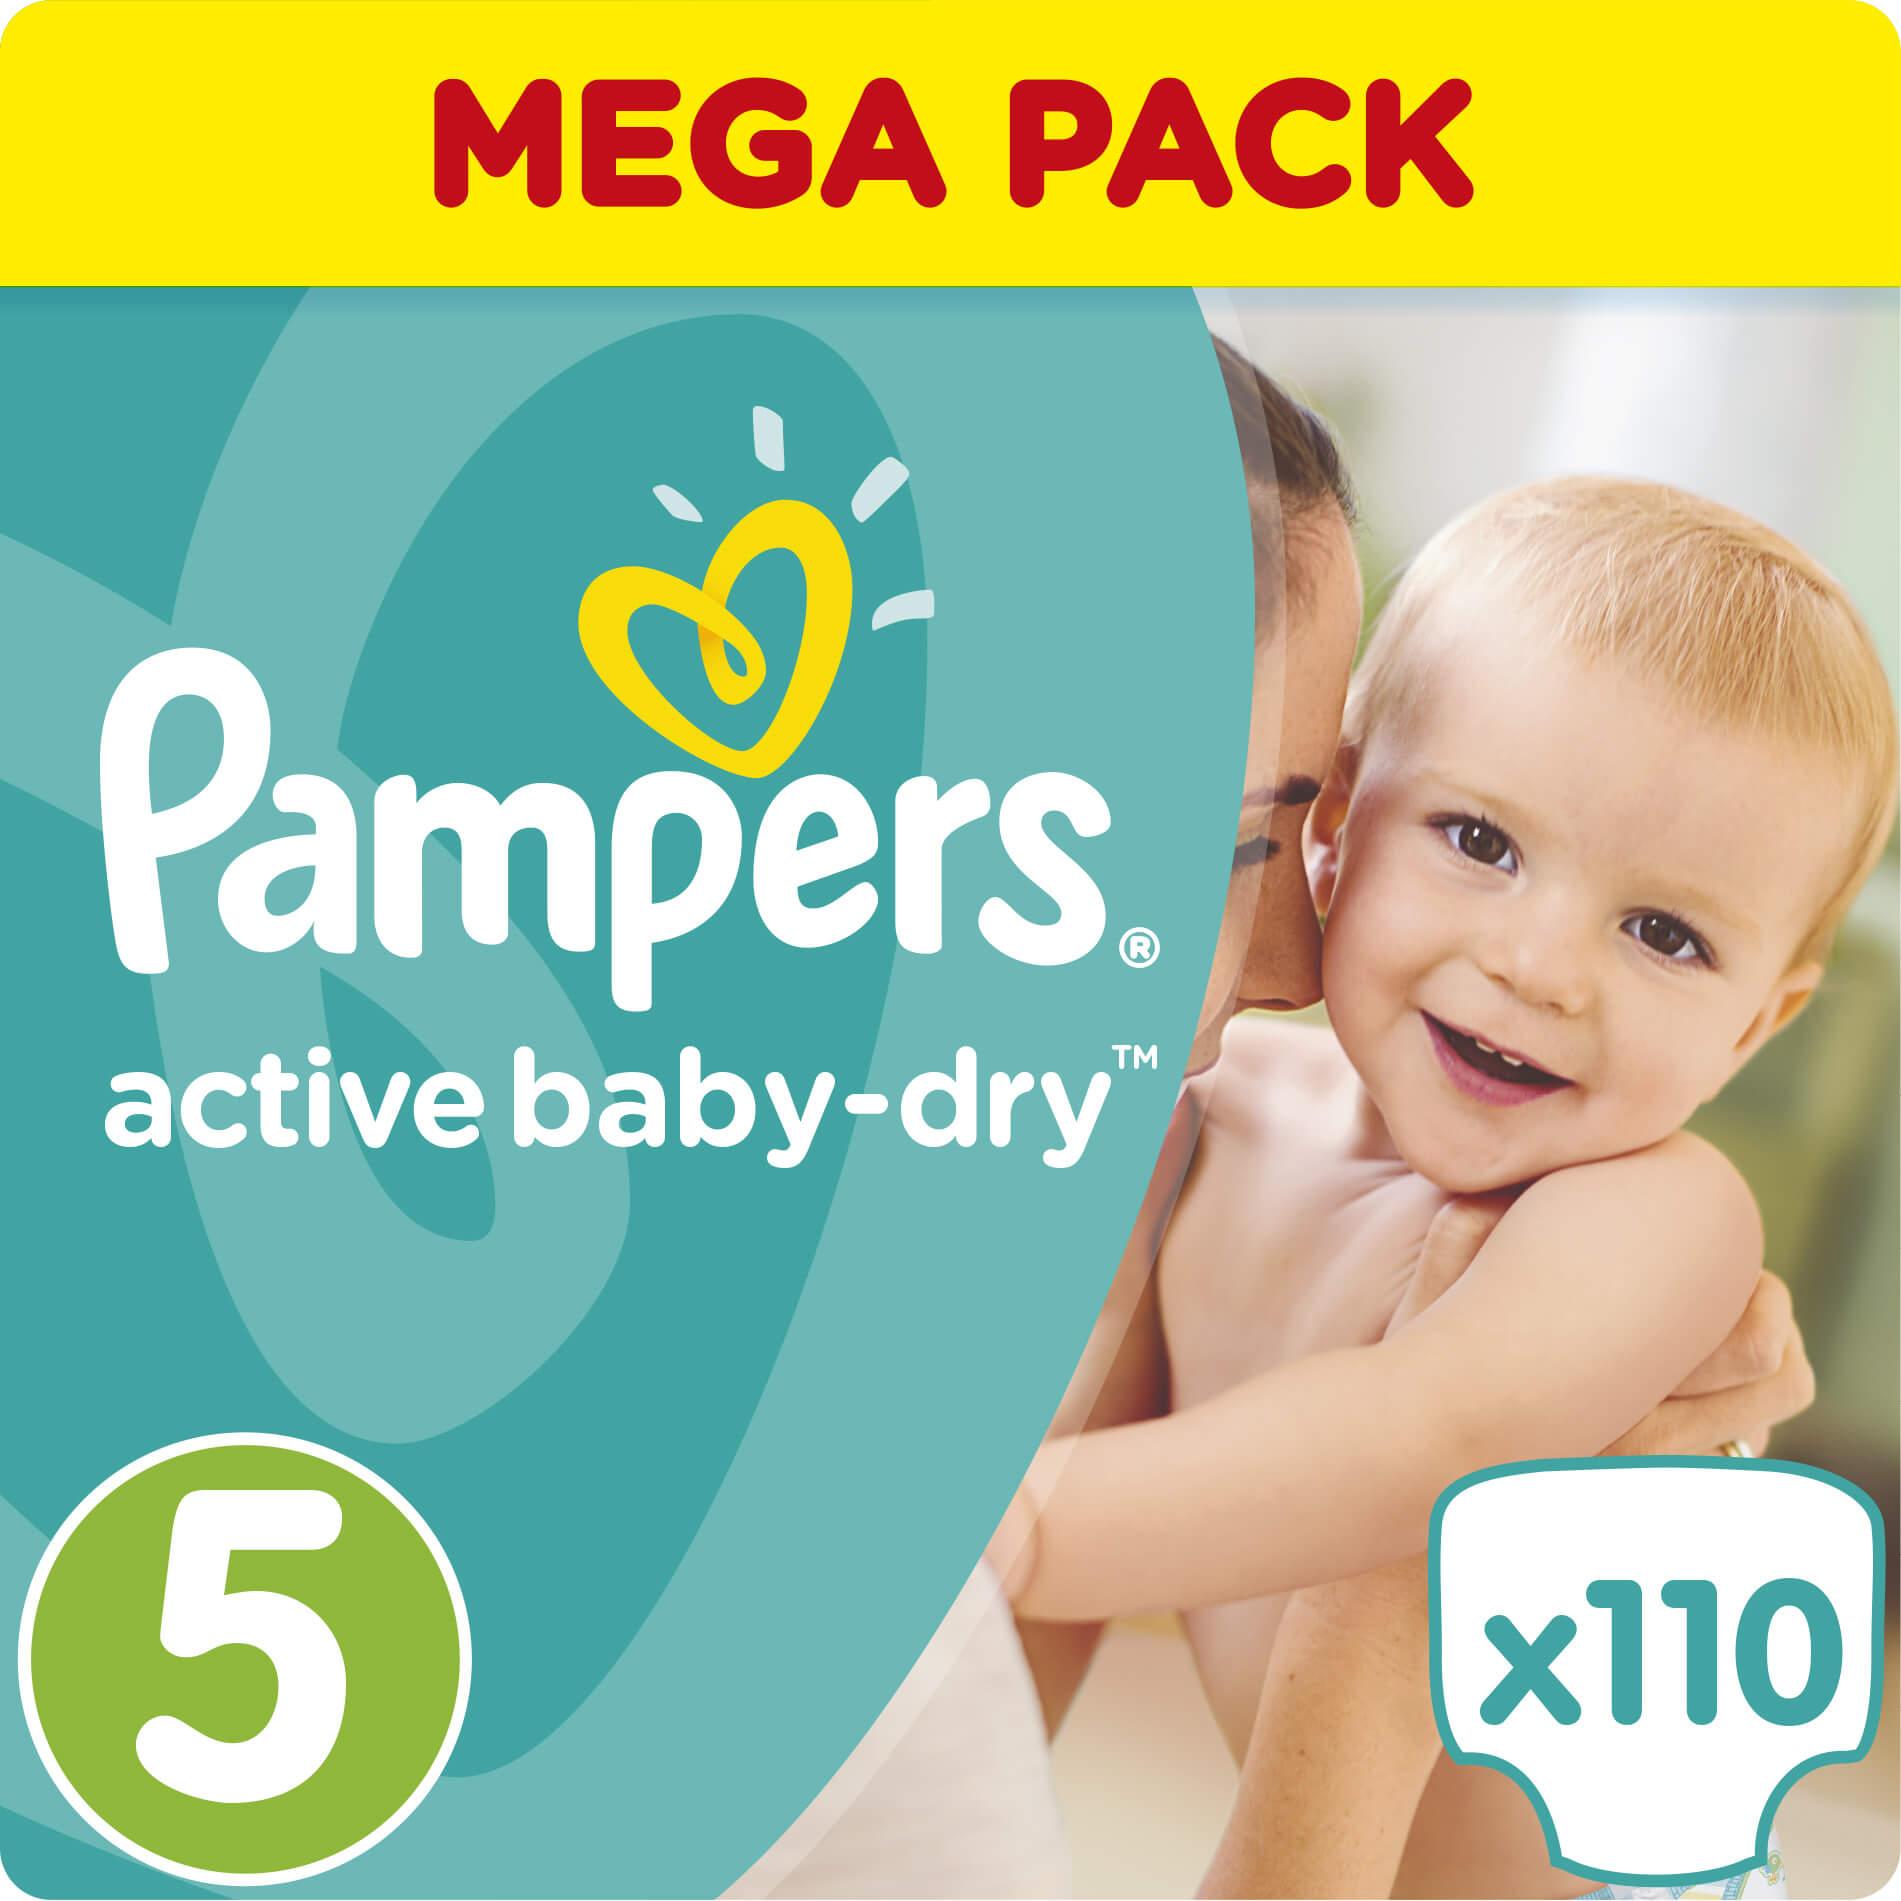 Pampers Active Baby Dry Mega Pack No5 (11-18kg) 110 Πάνες, μόνο 0,32€ / πάνα μητέρα παιδί   περιποίηση για το μωρό   πάνες για το μωρό